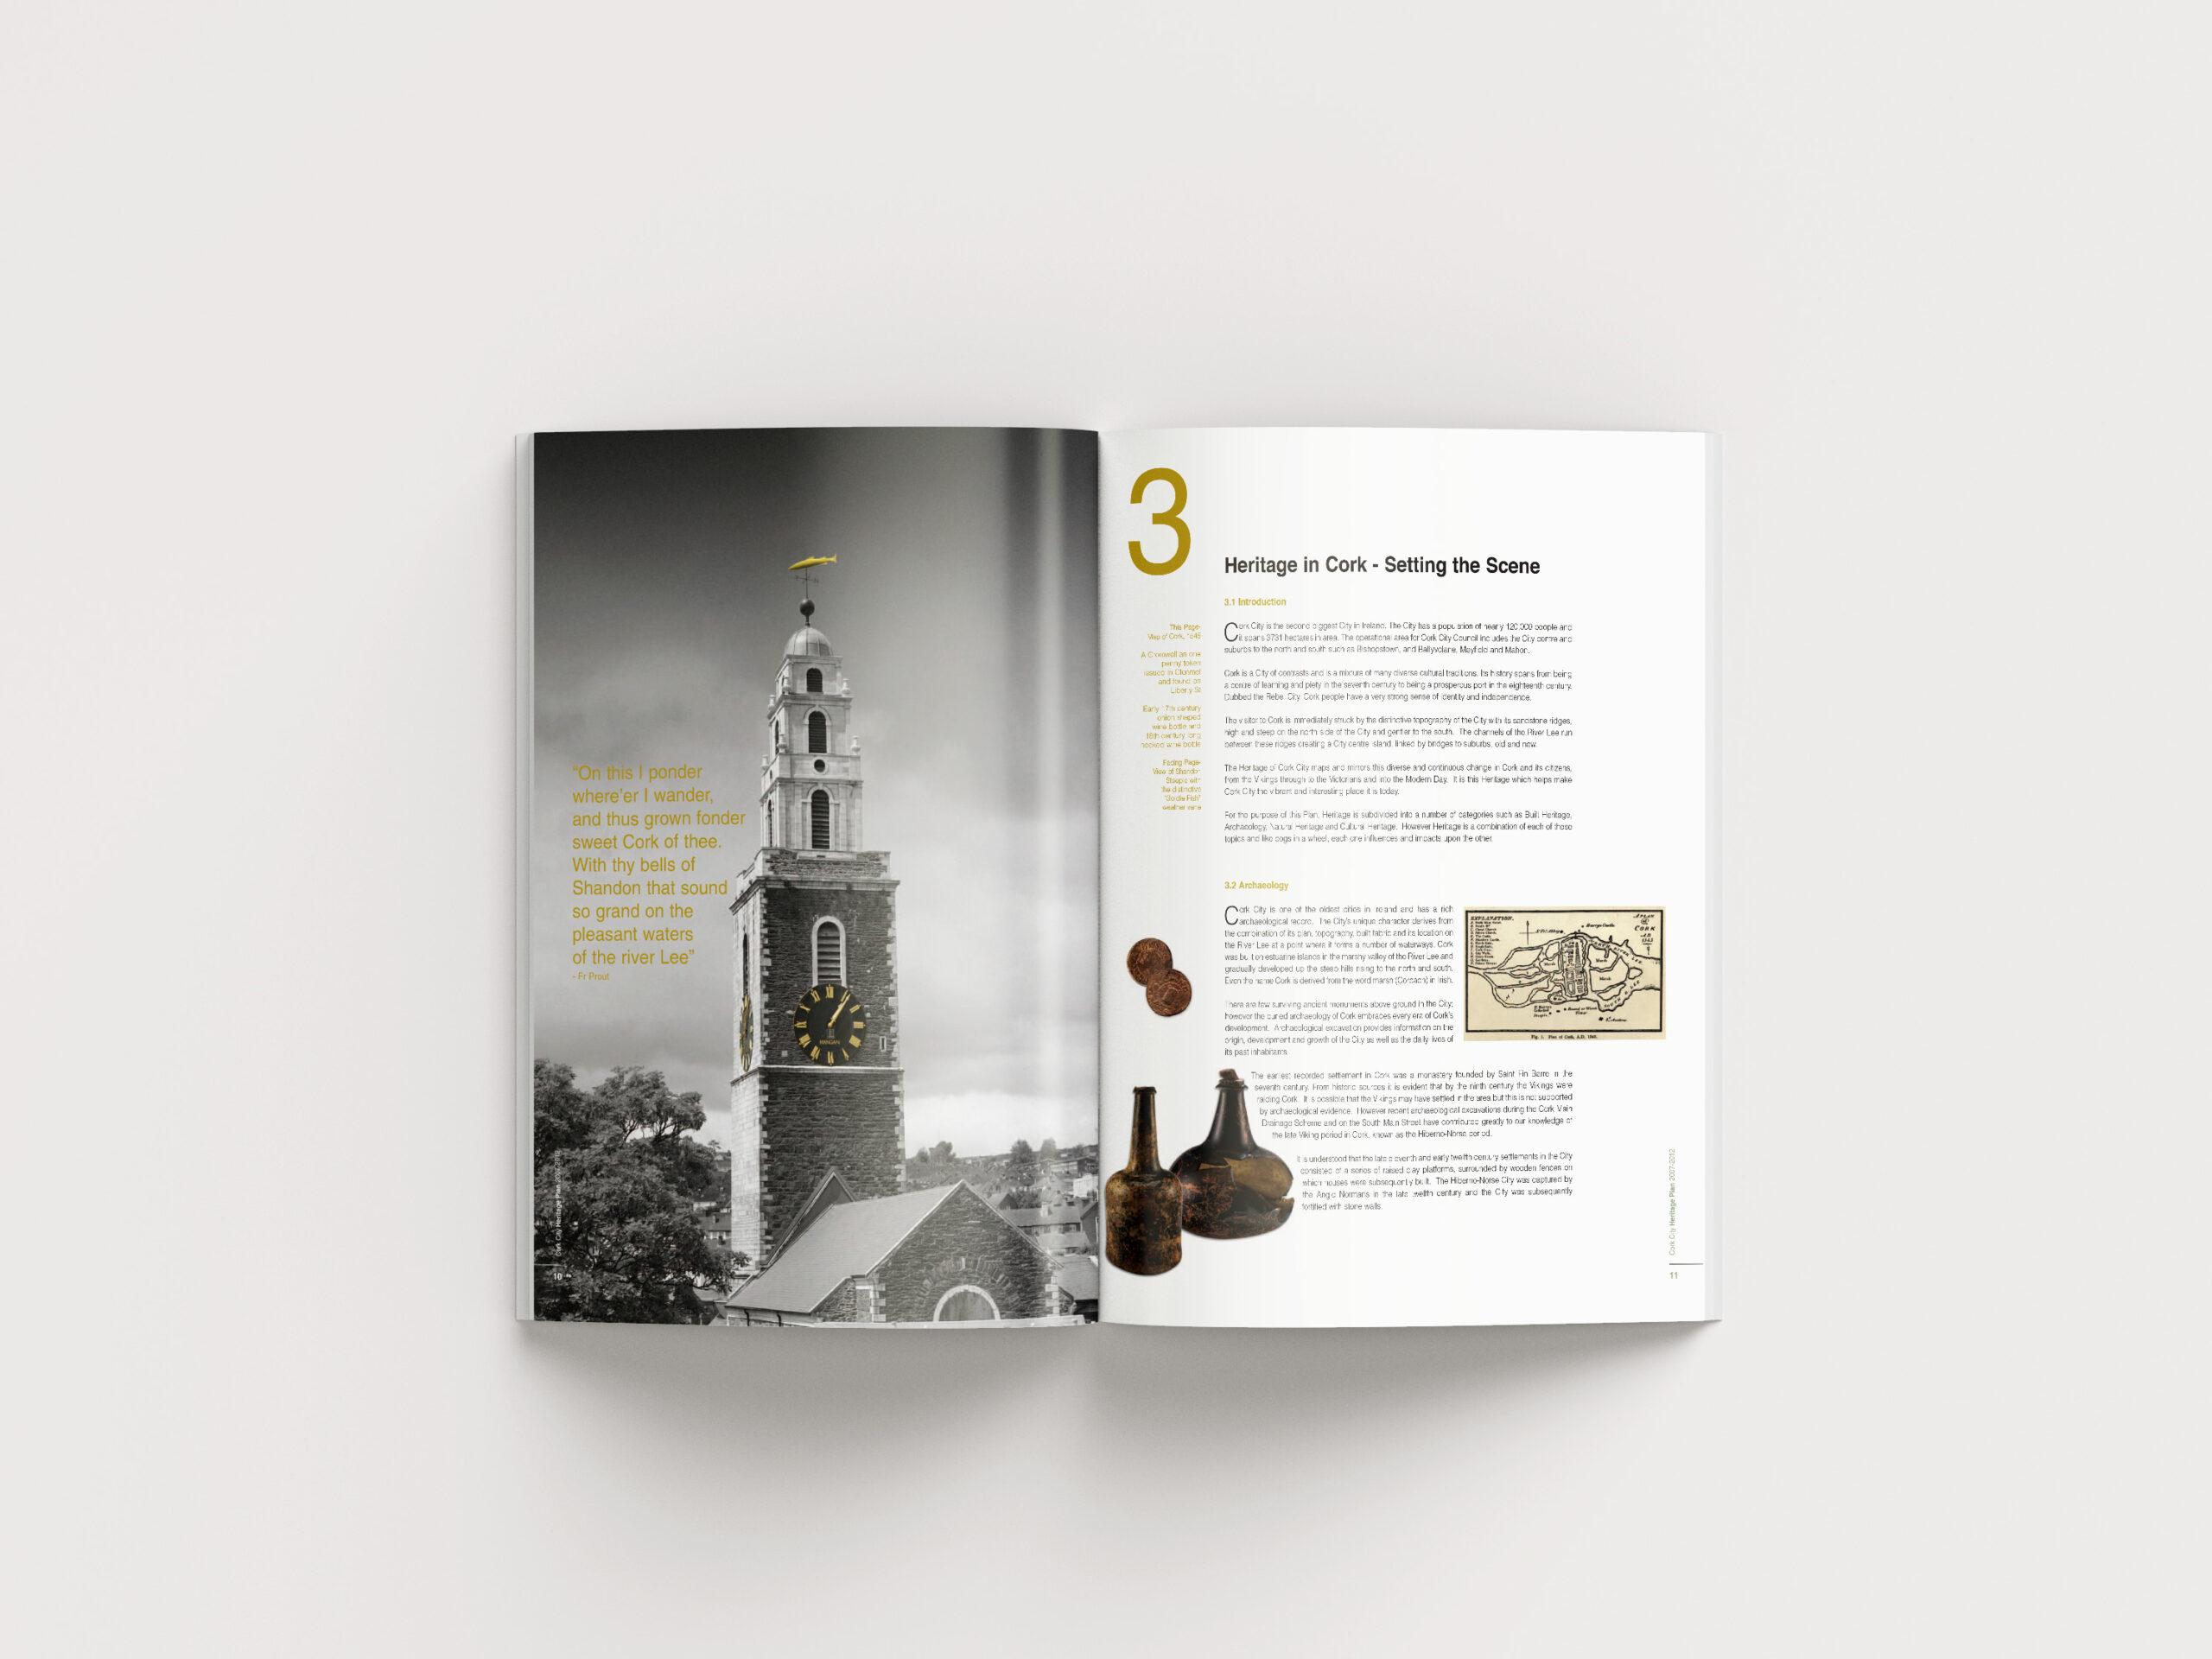 Inside Spread of Heritage Book